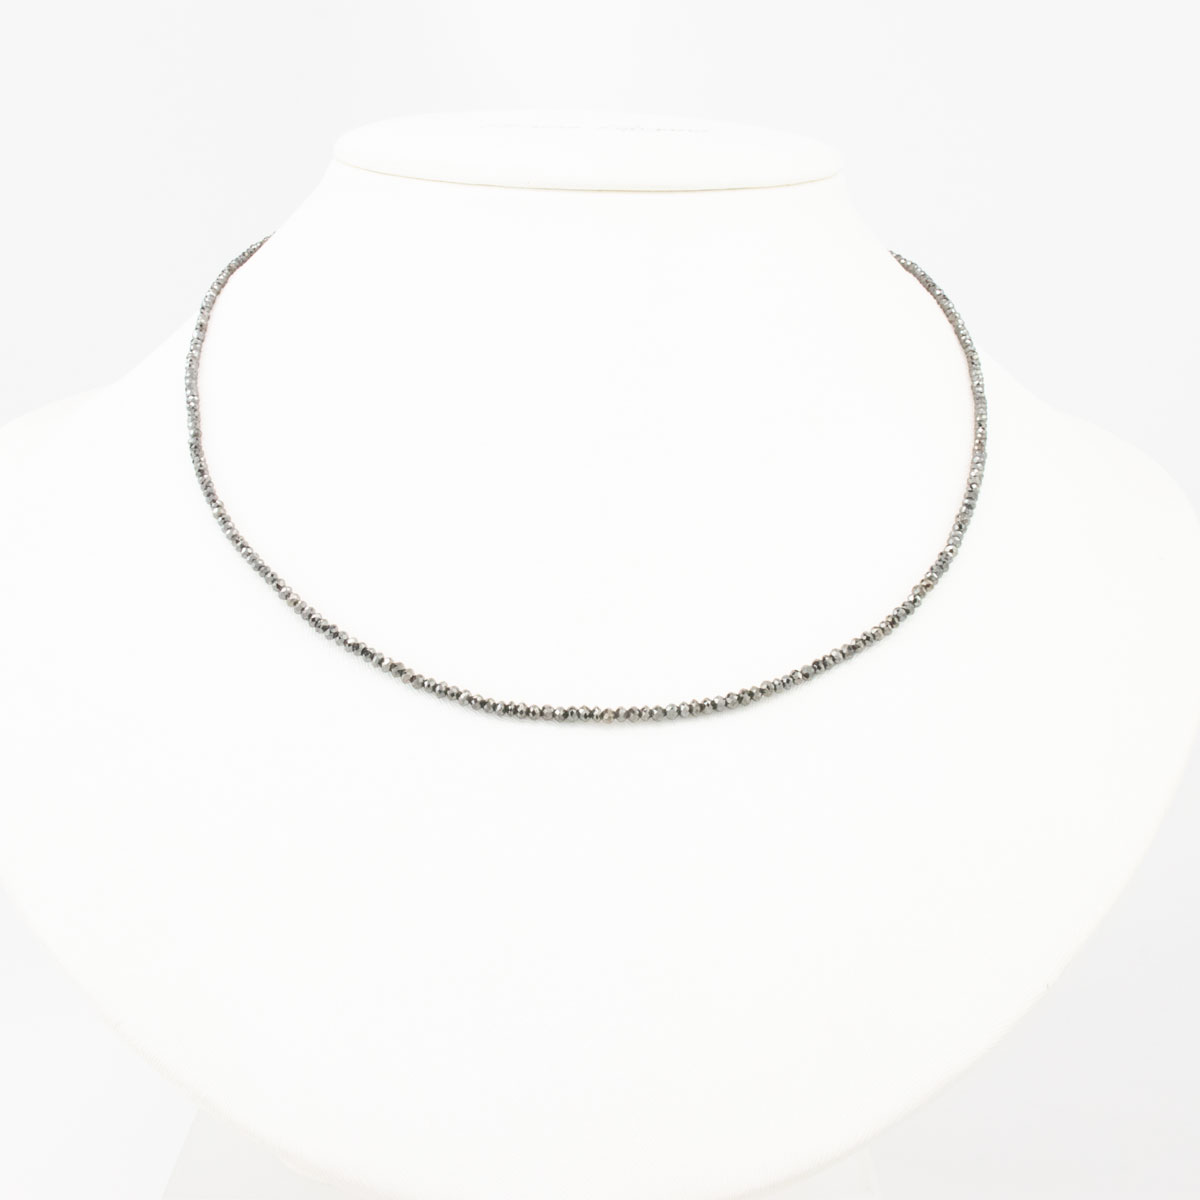 18 Carat Black Diamond Necklace, 14k White Gold